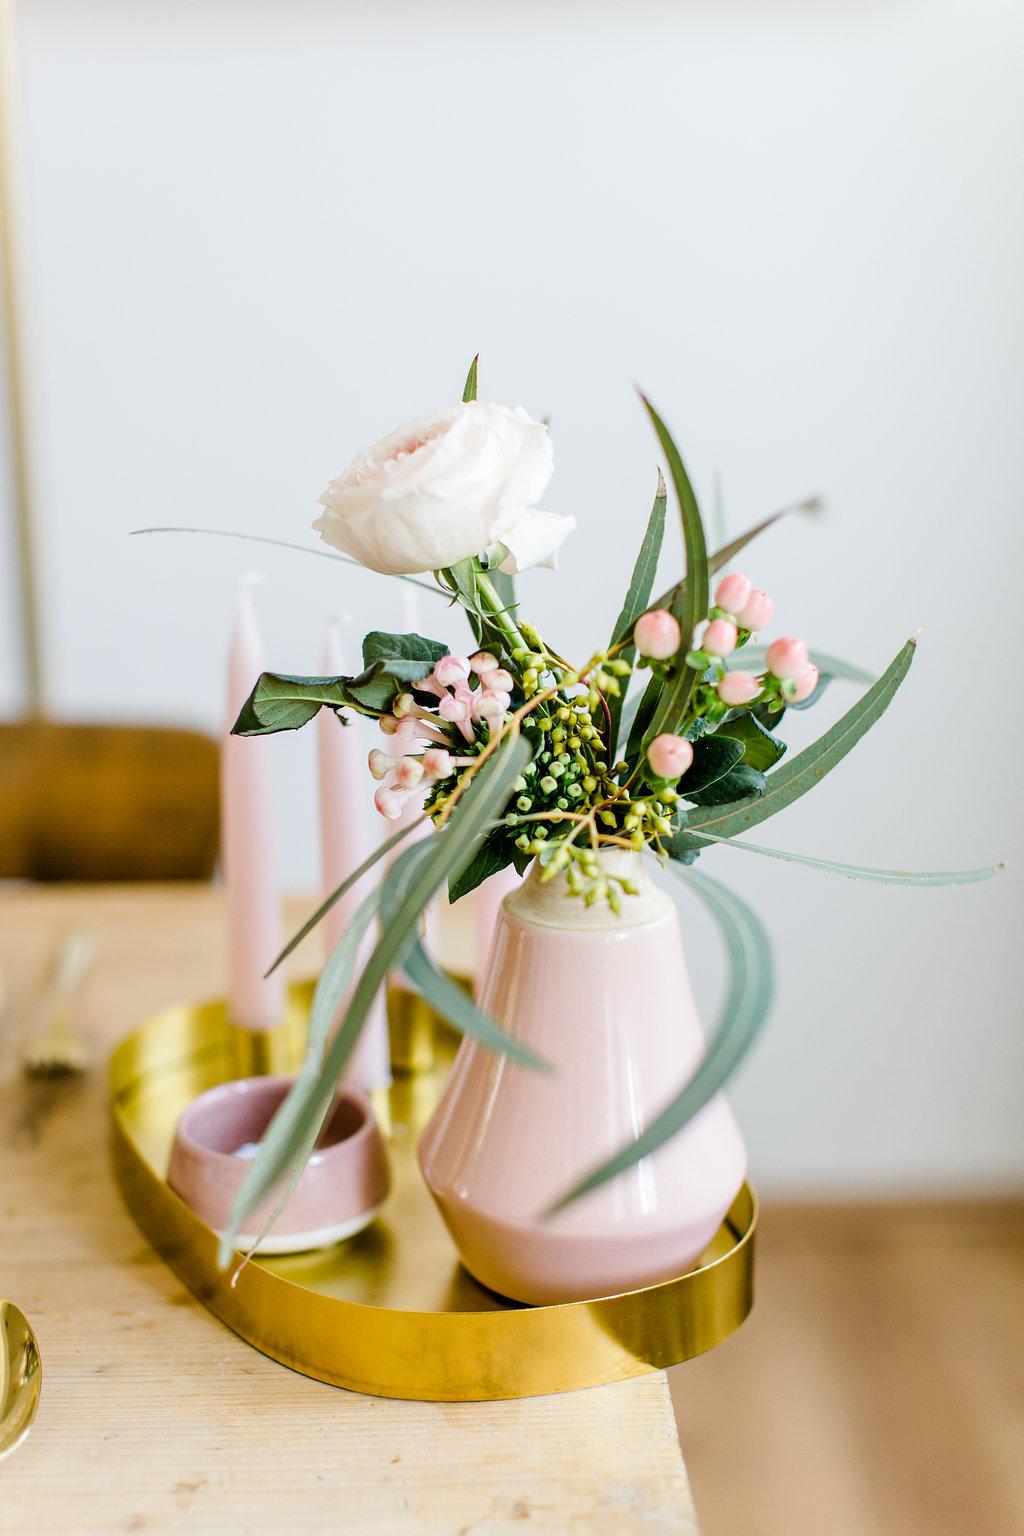 Blumenschmuck Tischdeko Ideen